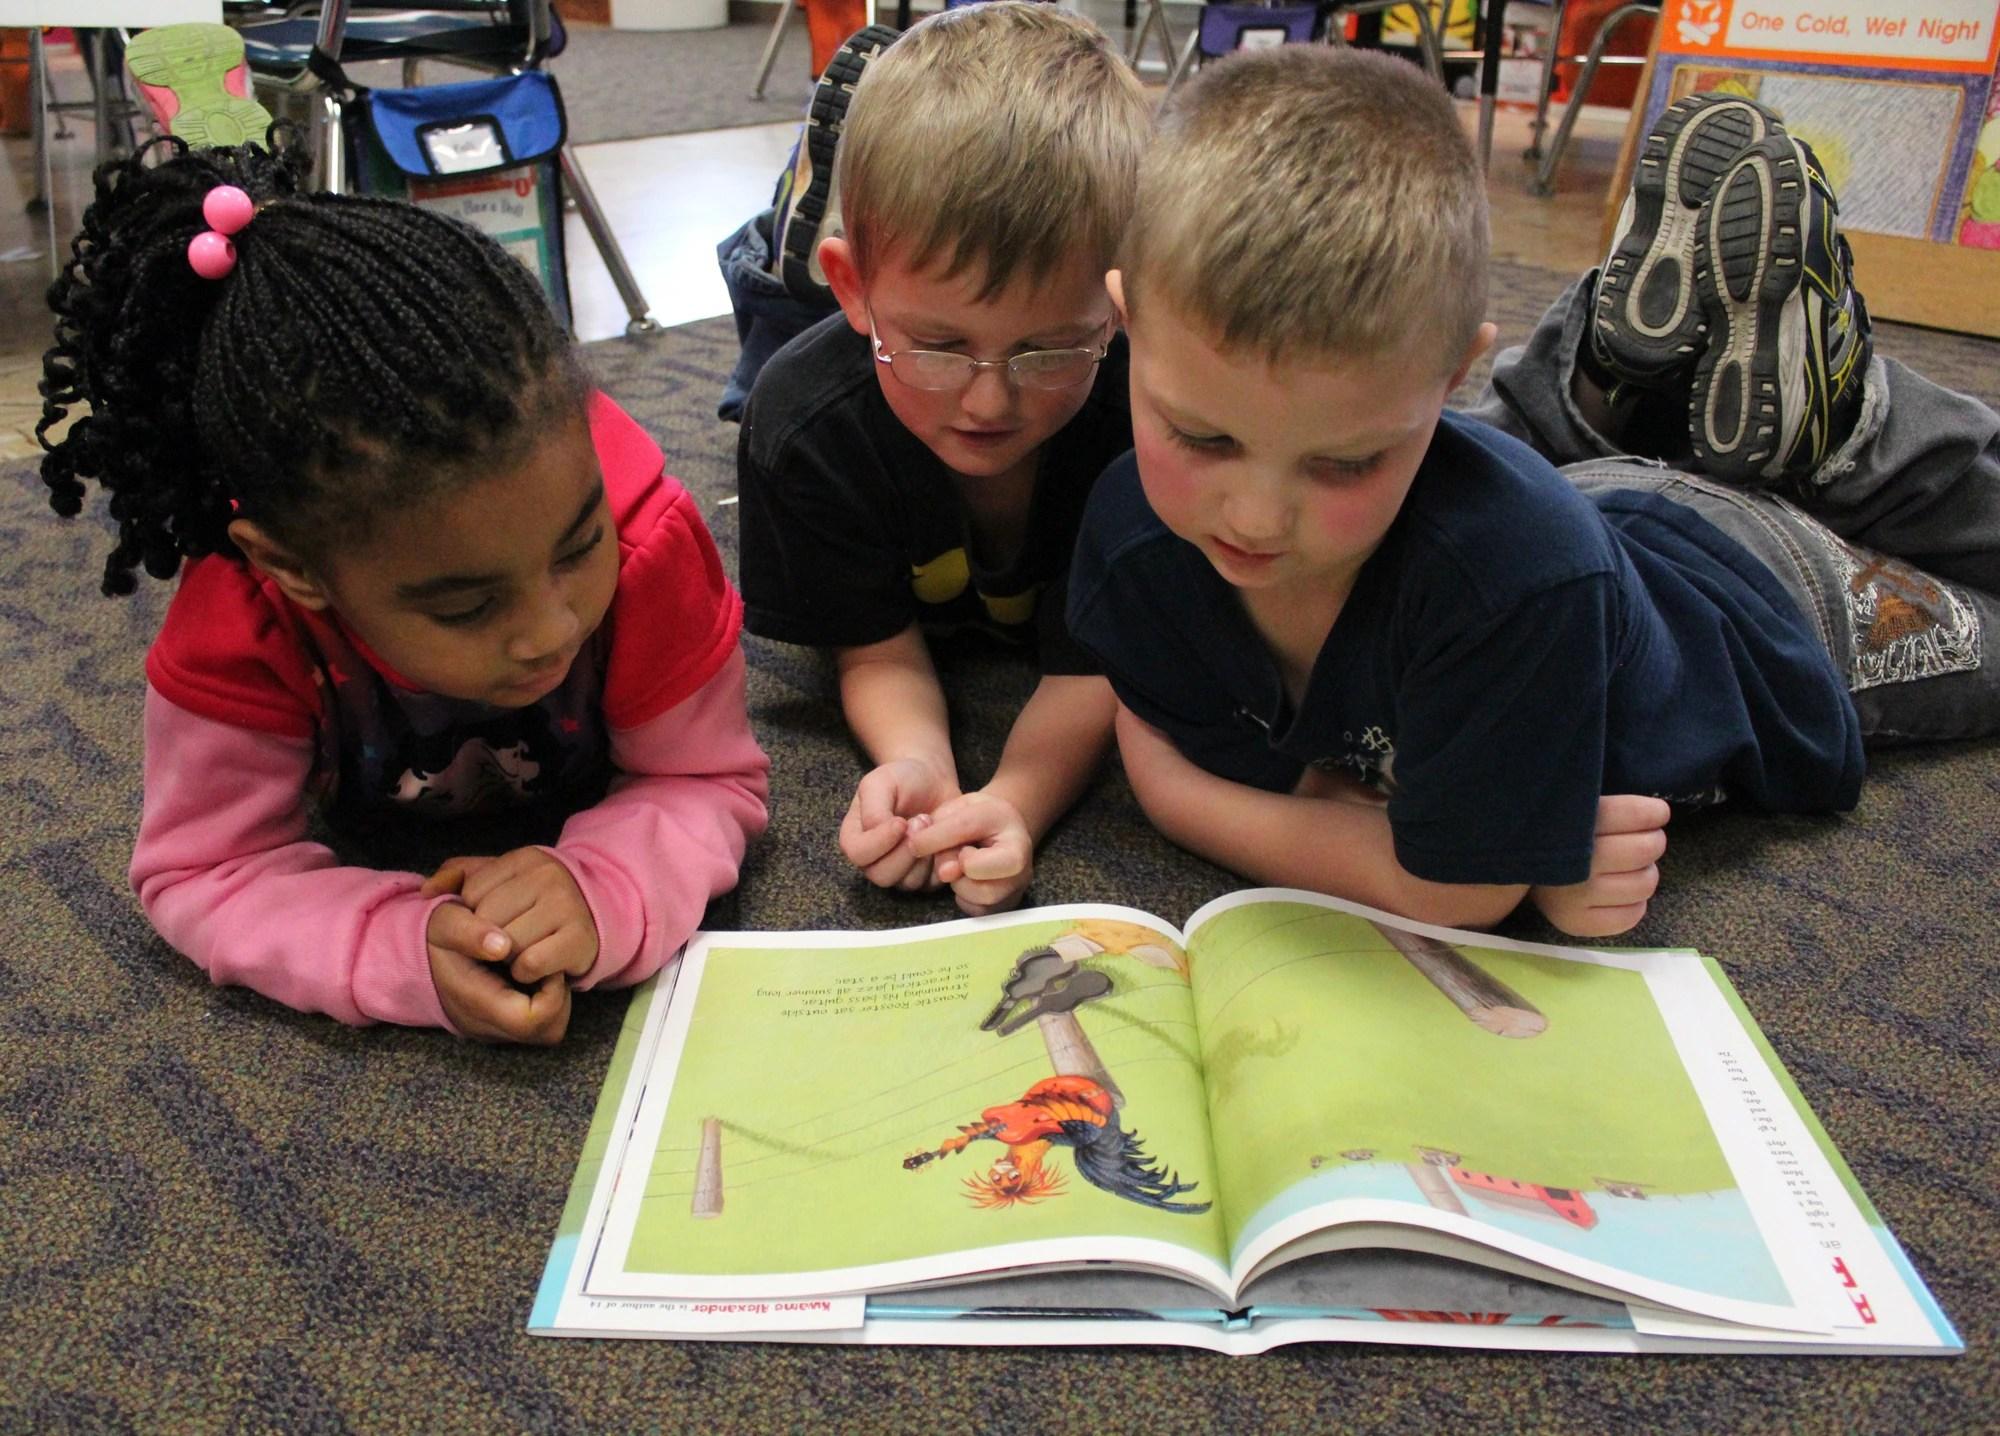 Md Teachers Union Wants Kindergarten Tests Suspended